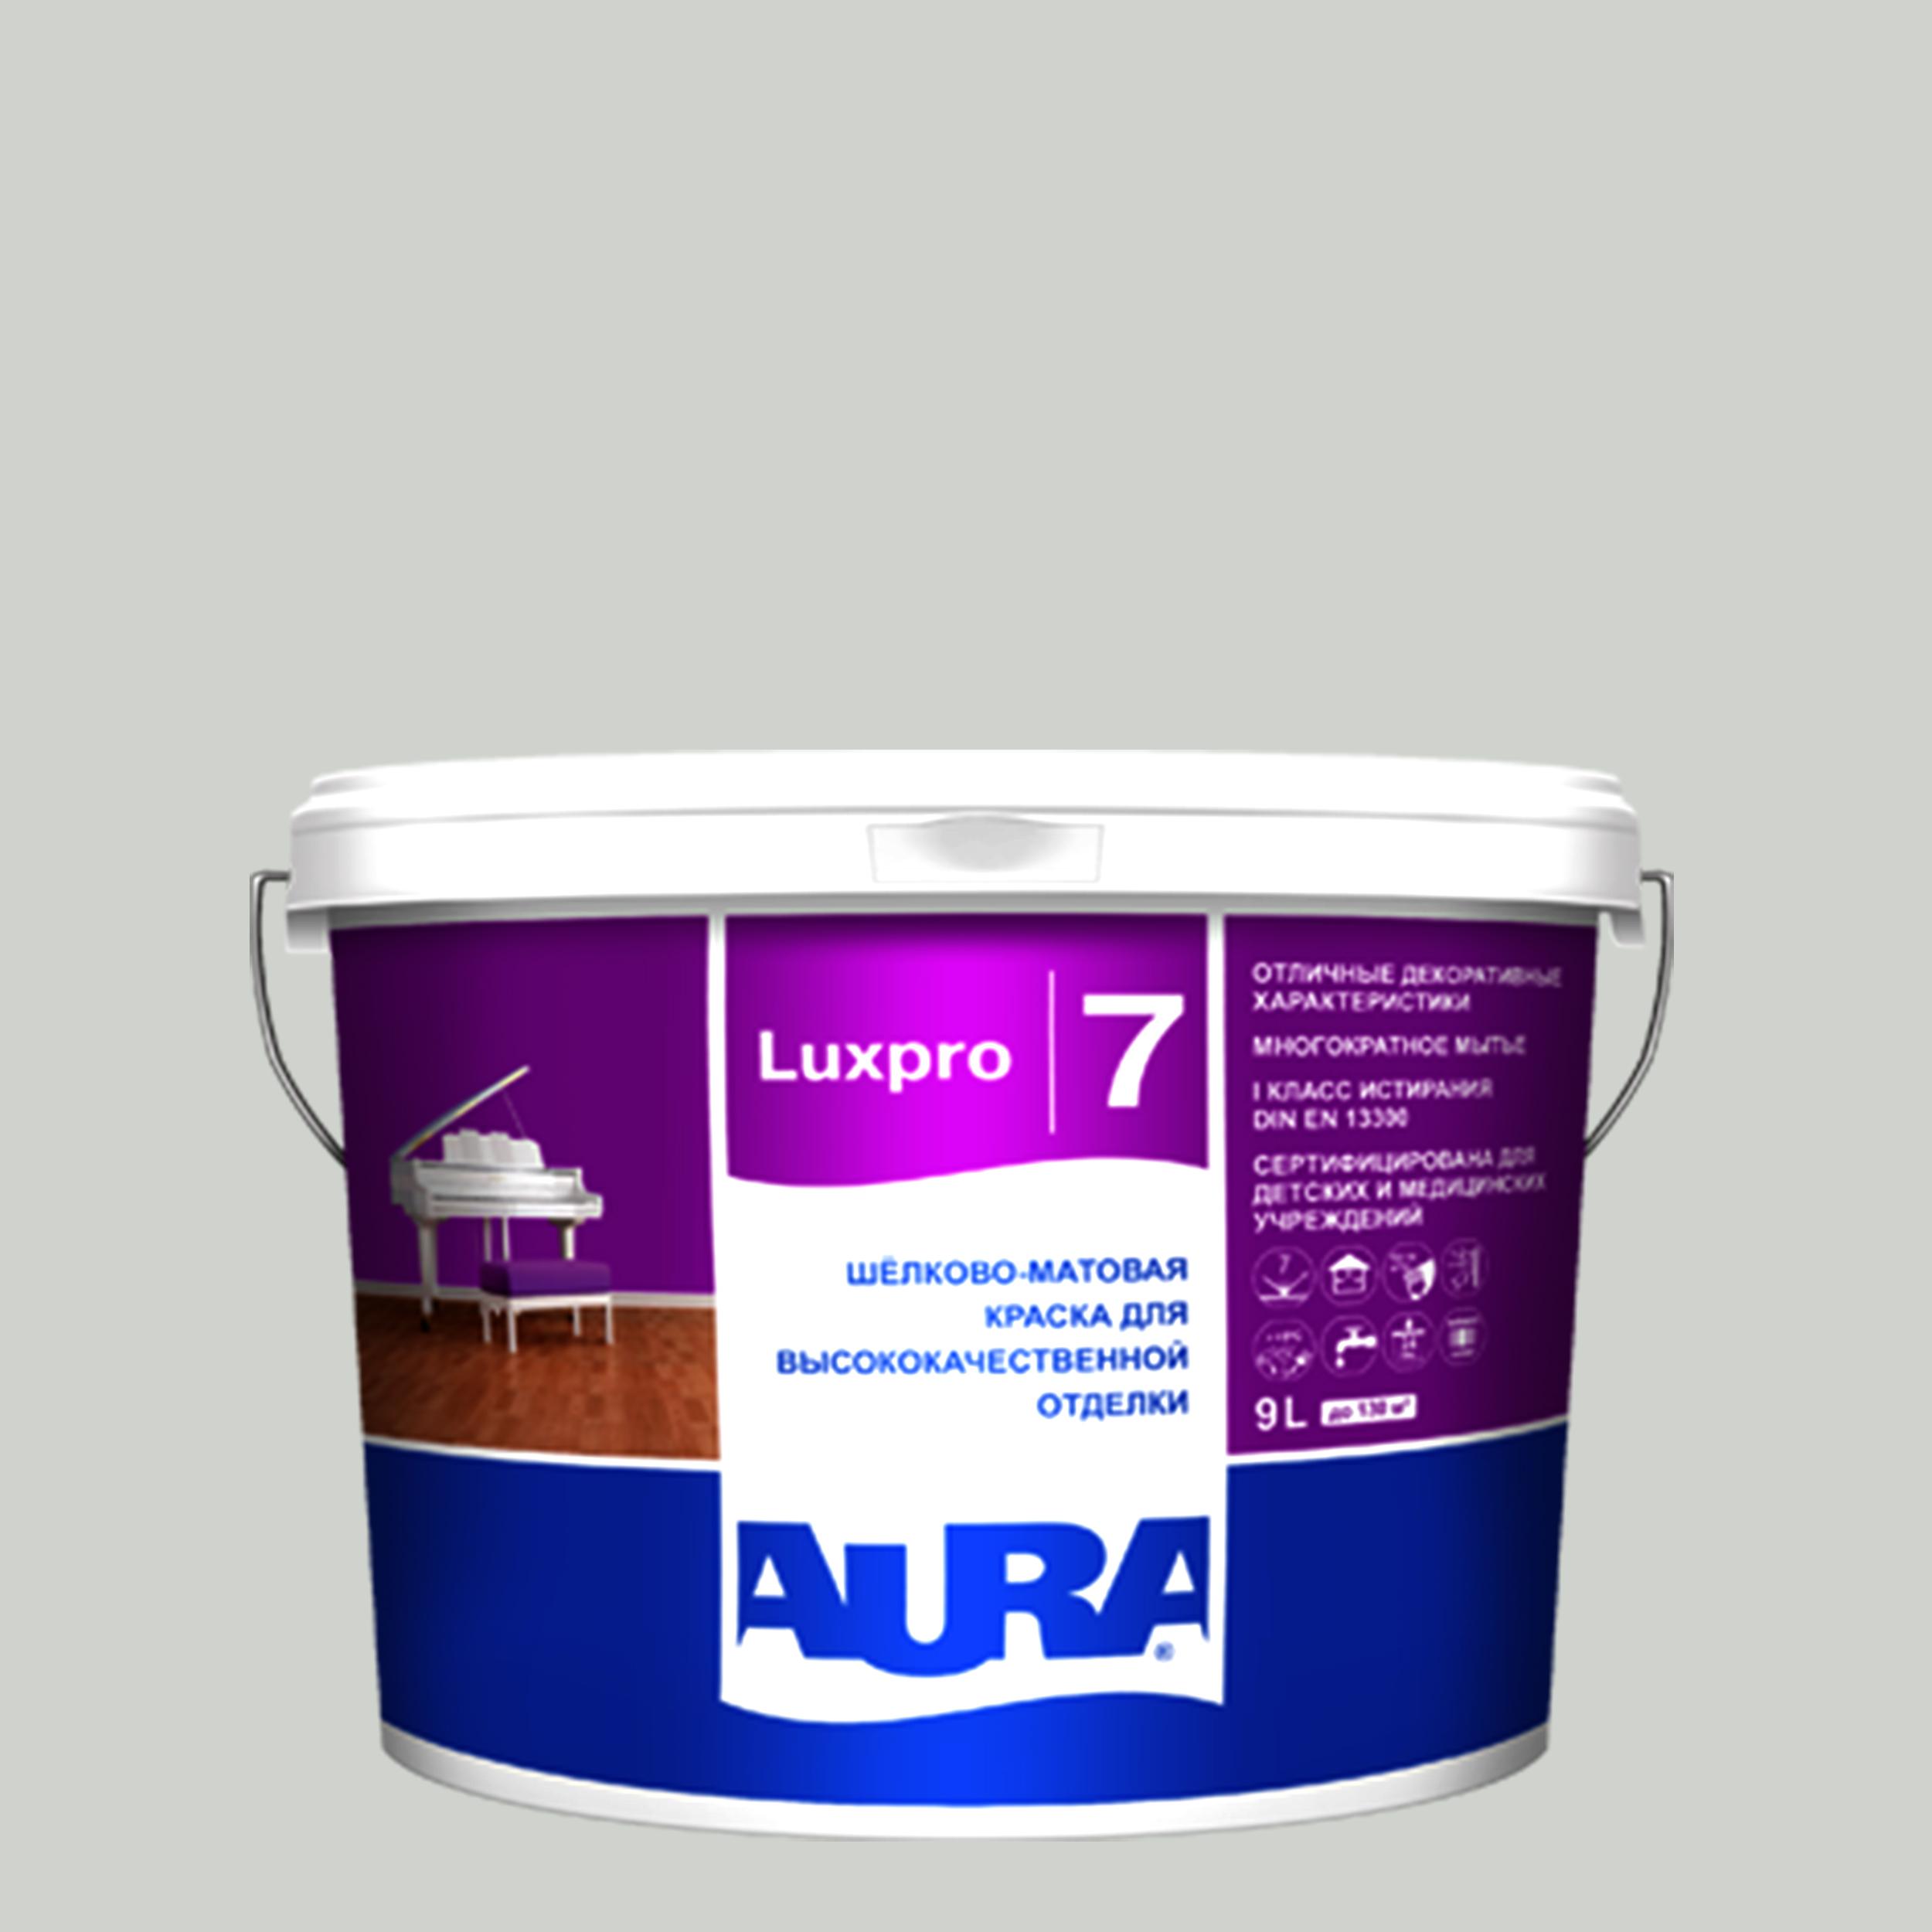 Фото 5 - Краска интерьерная, Aura LuxPRO 7, RAL 8000, 11 кг.